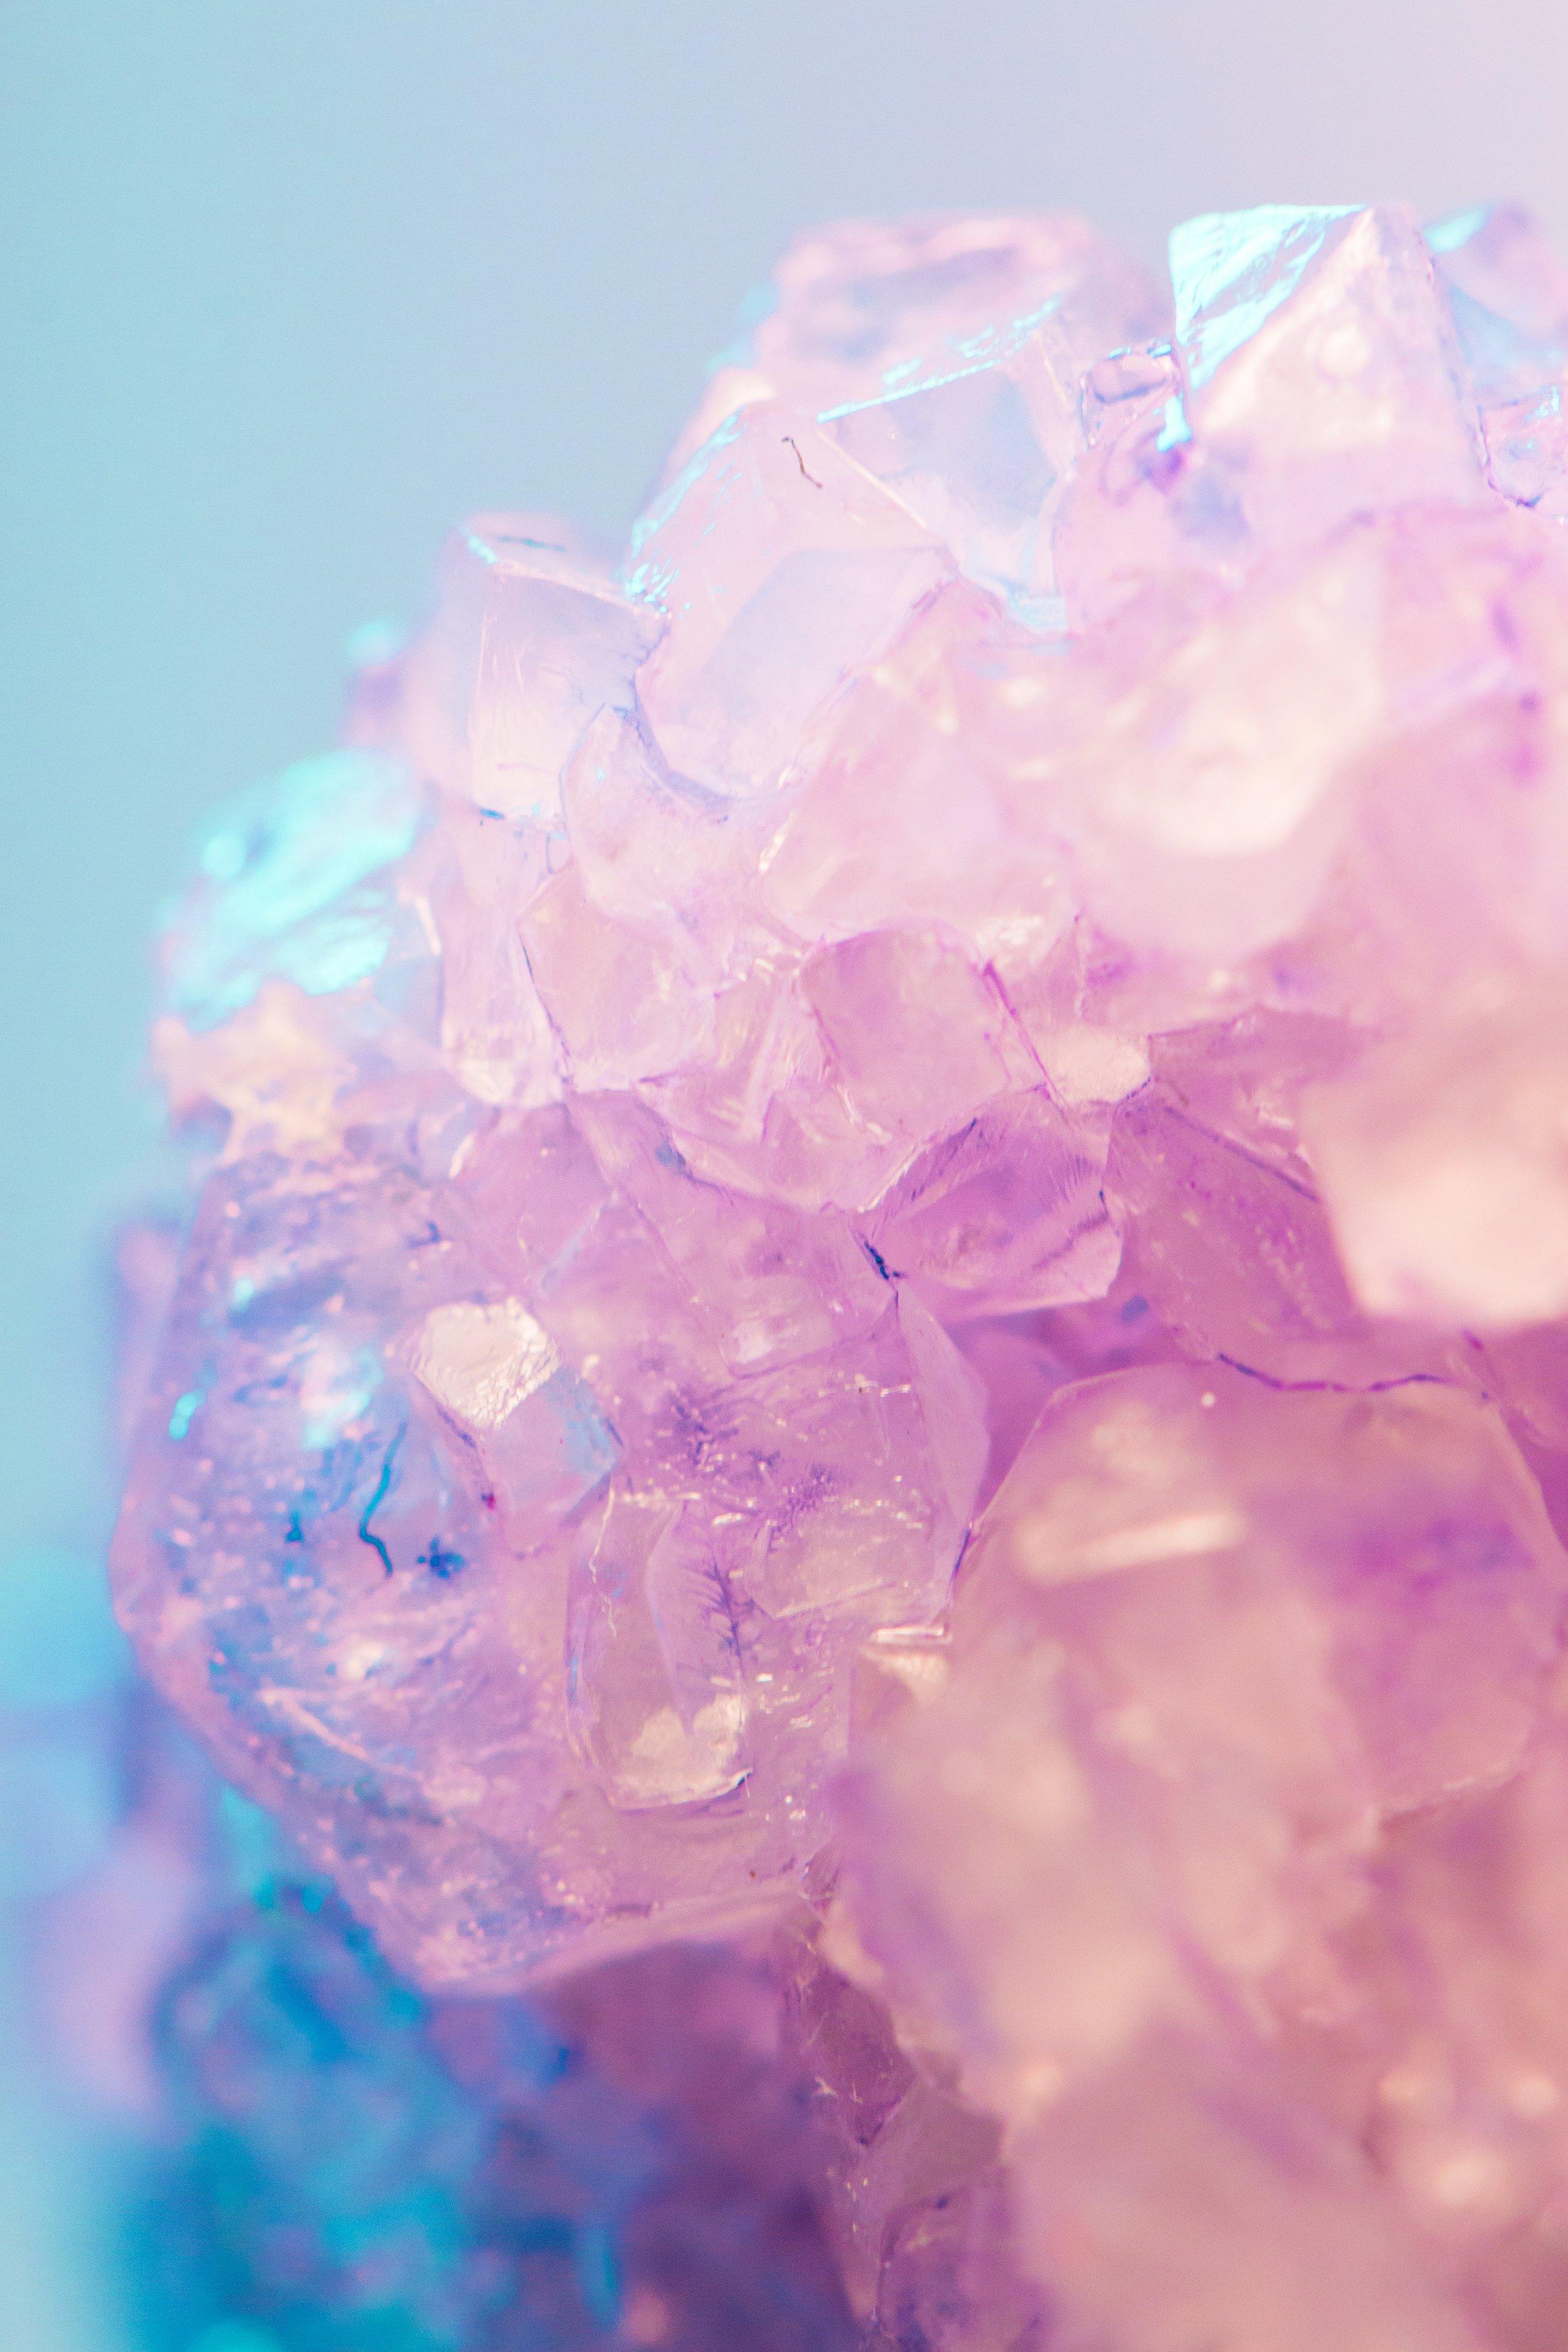 explore the healing effectsof Reiki -